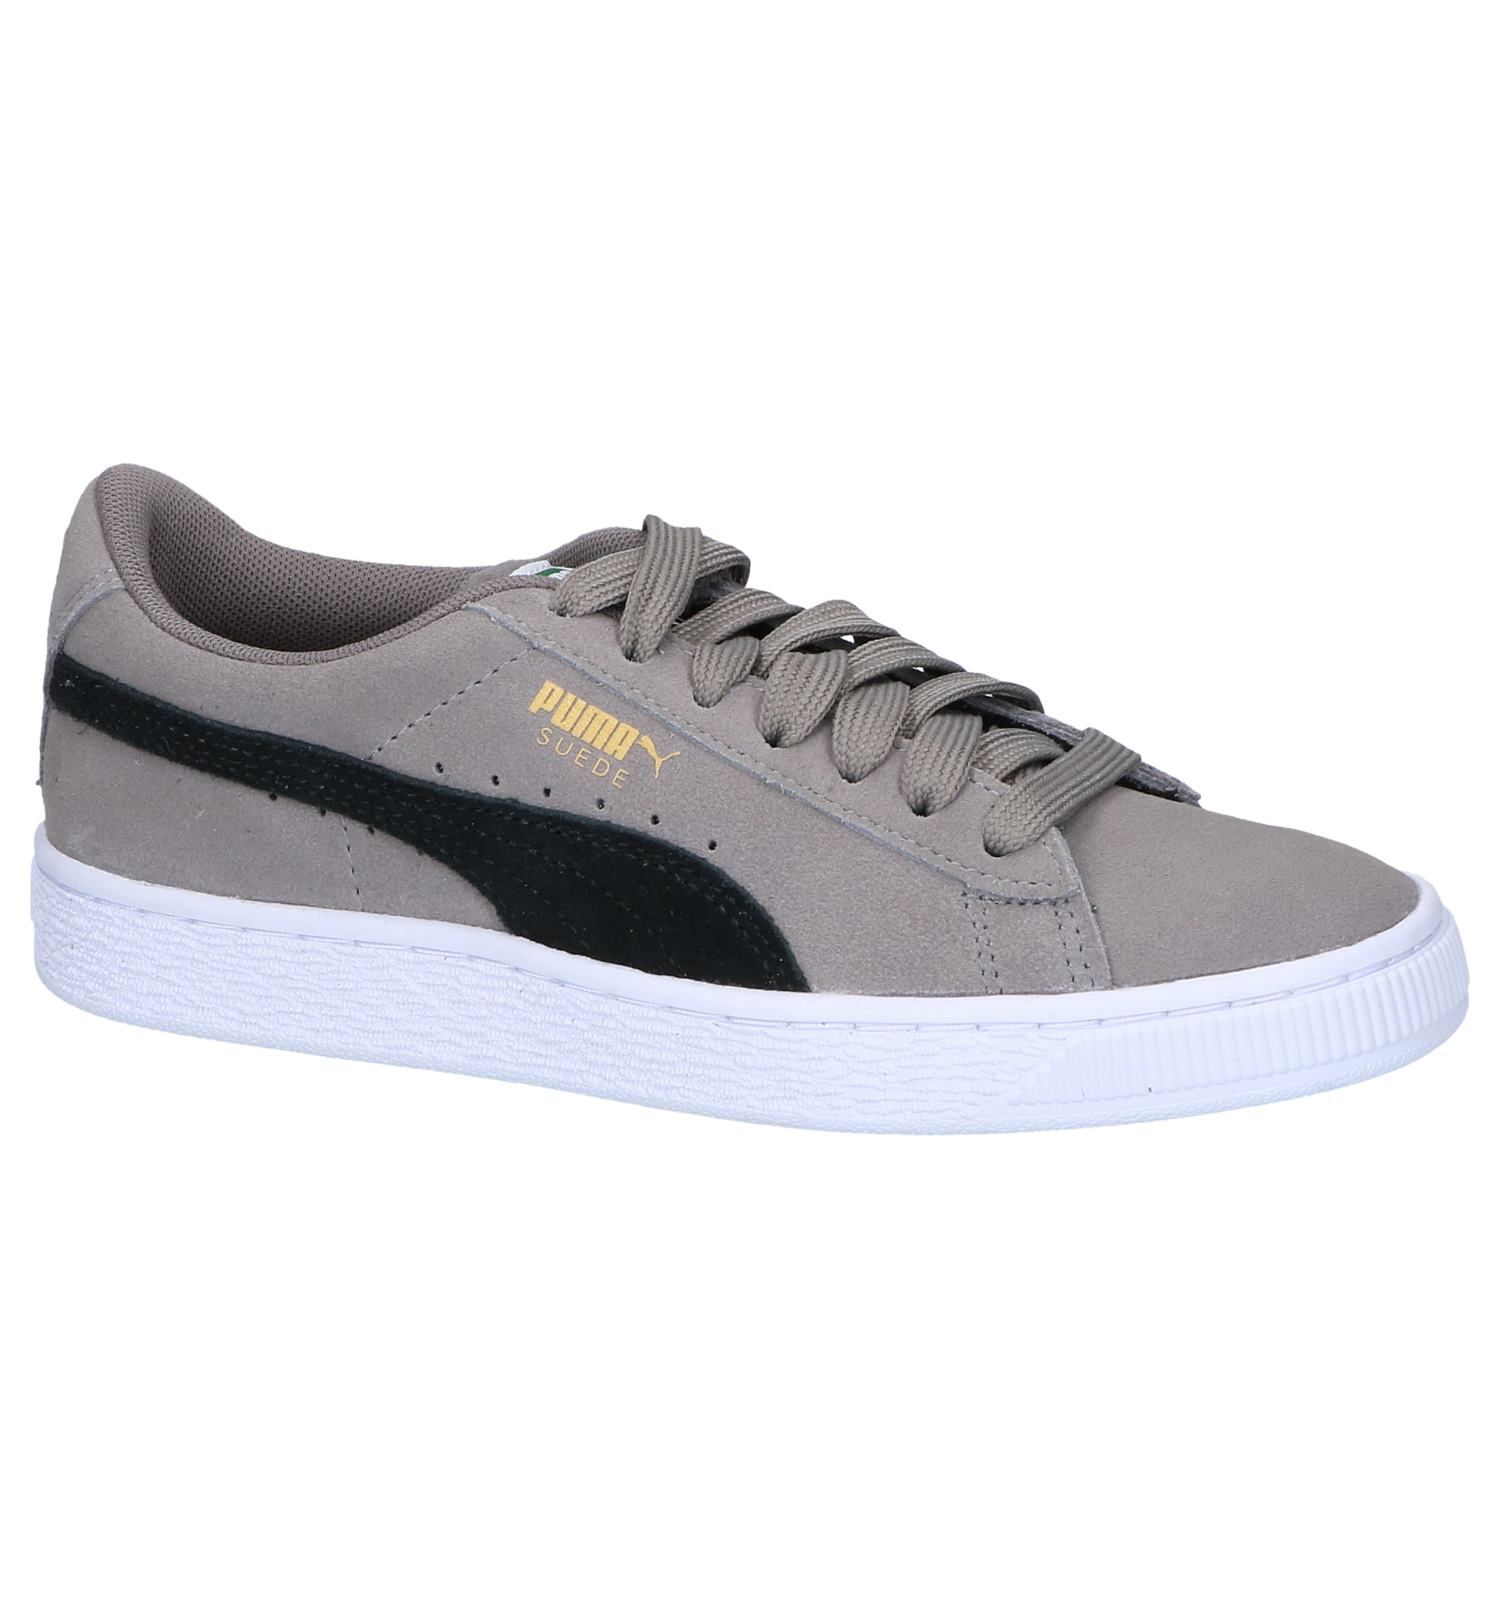 056c0006b20 Grijze Sneakers Puma Suede Classic | TORFS.BE | Gratis verzend en retour